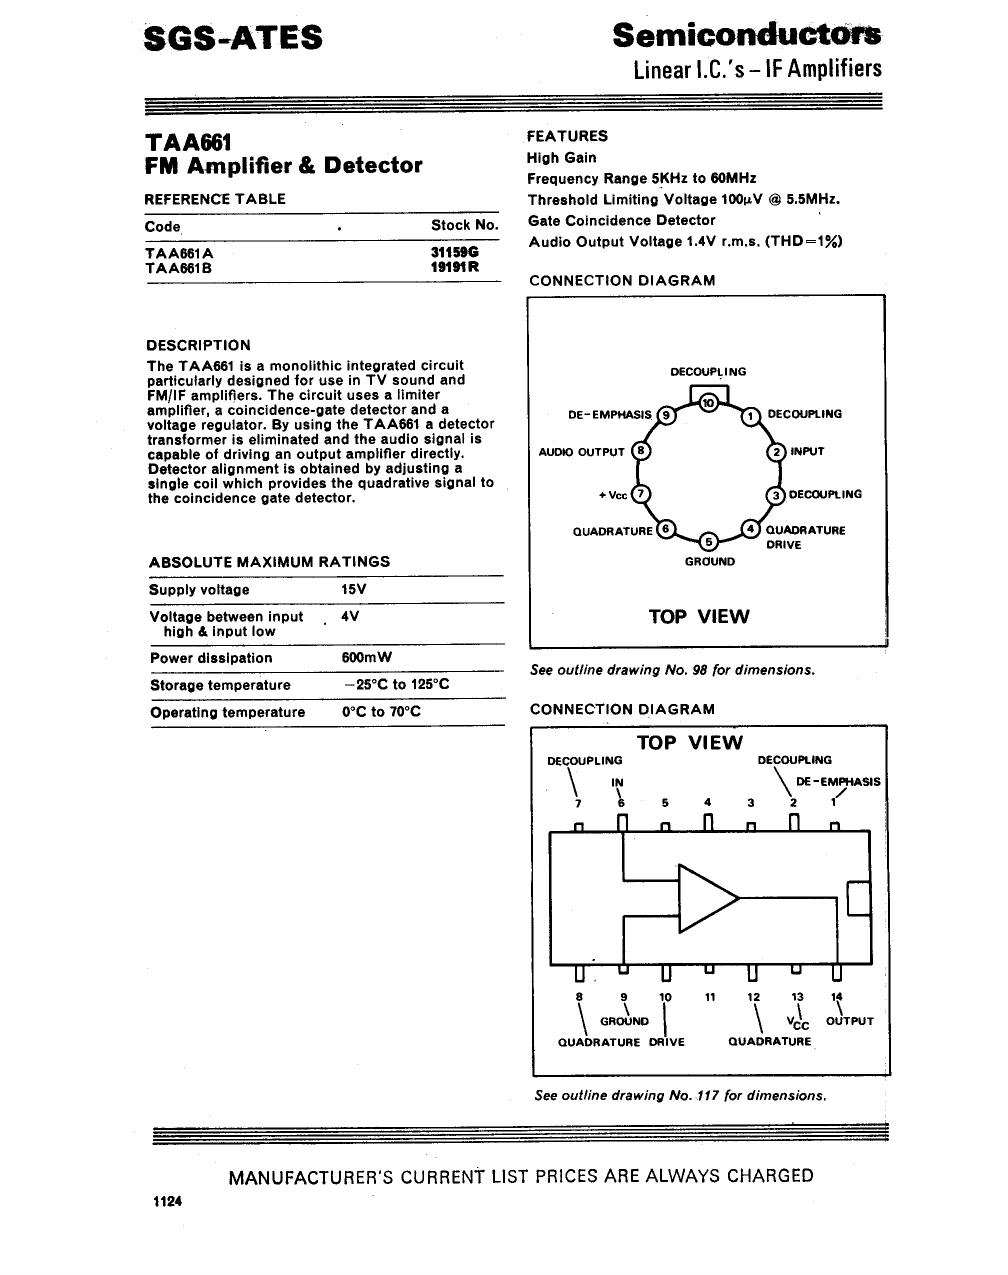 TAA661B datasheet